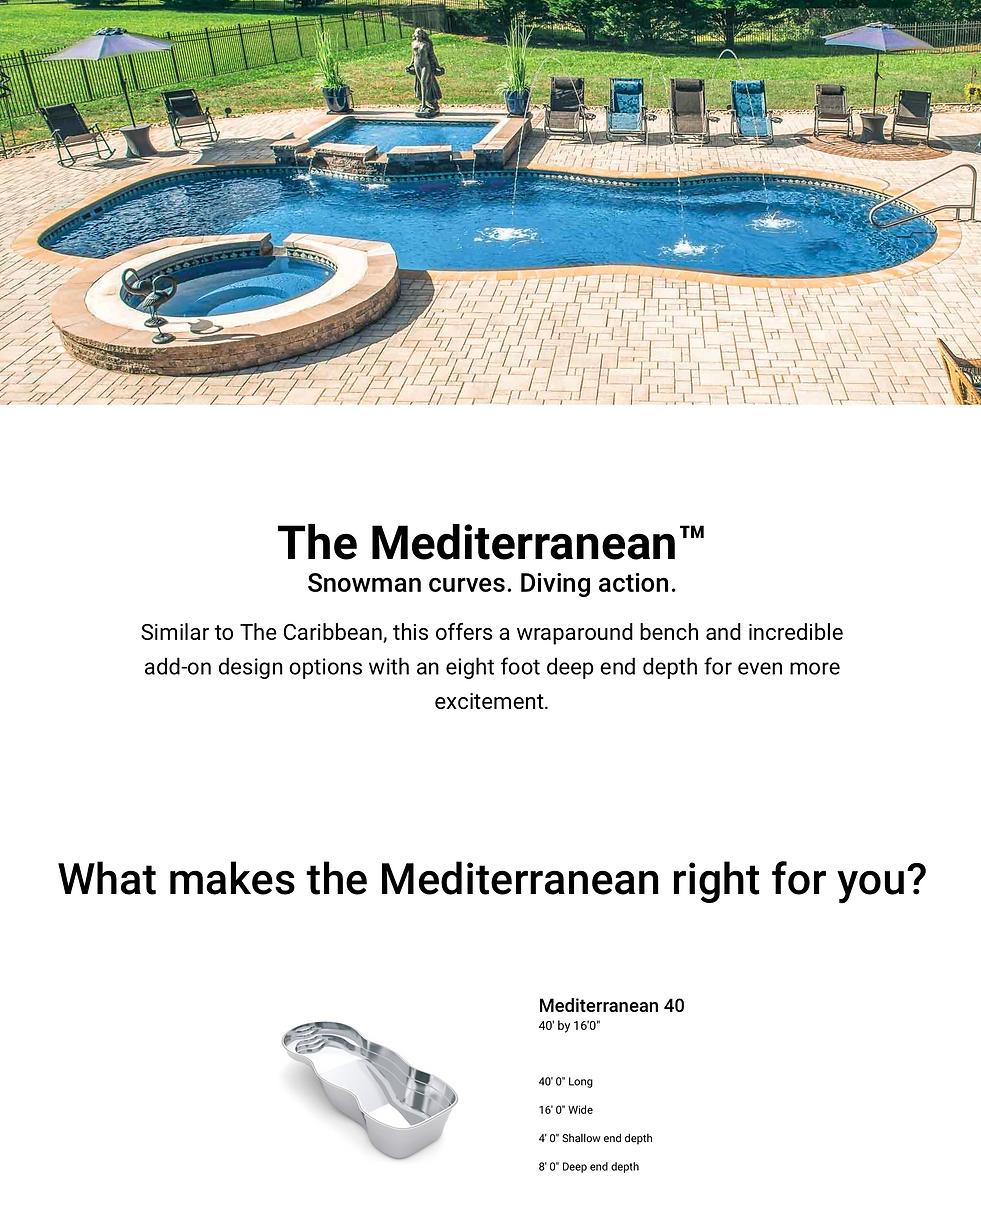 The Mediterranean Design.png